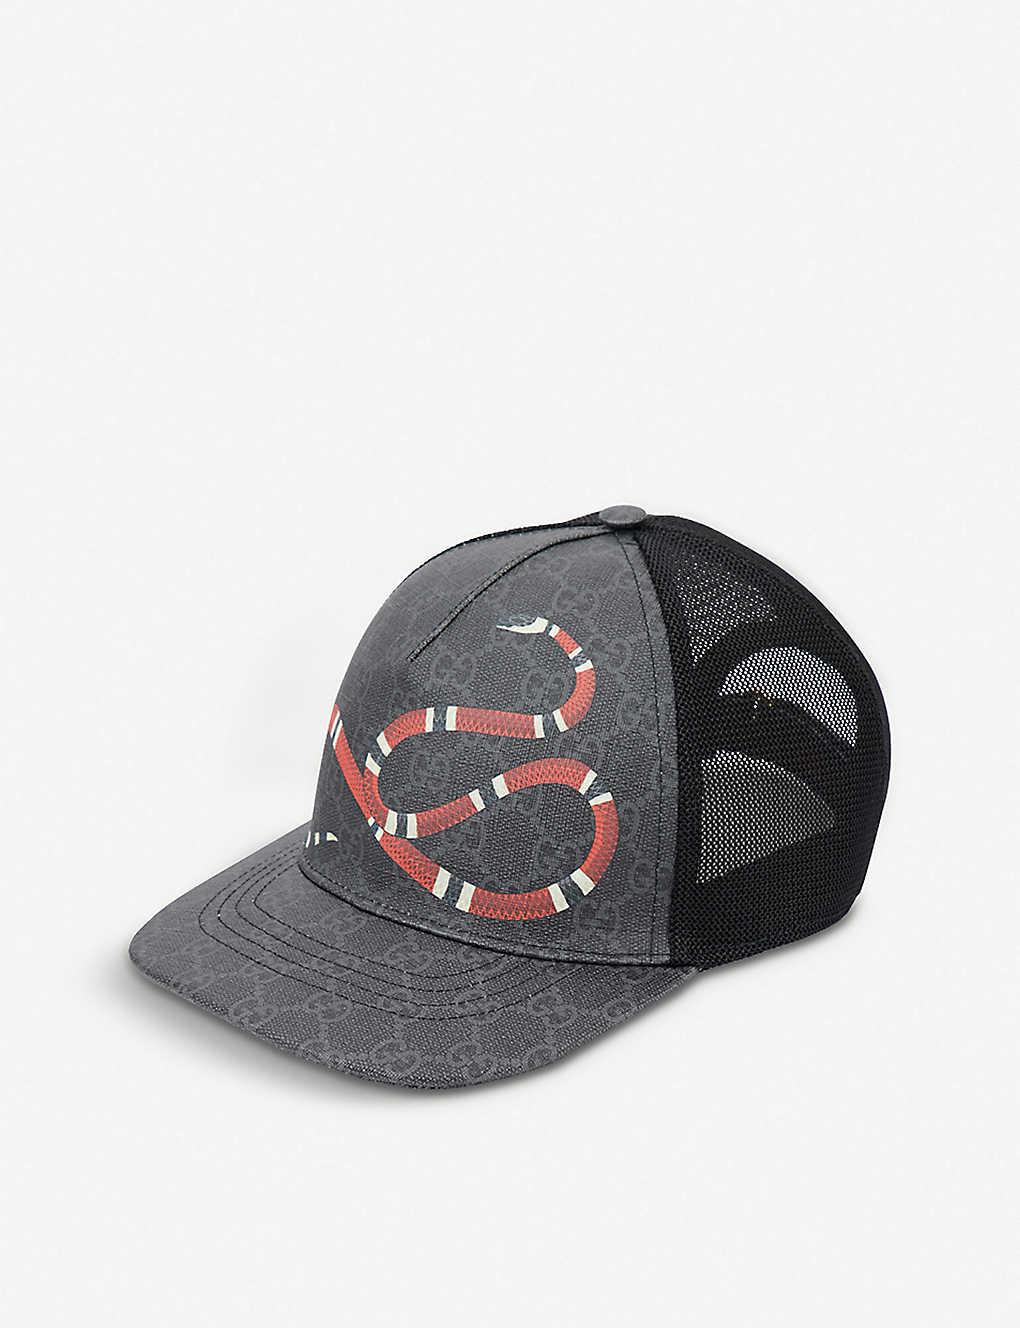 GUCCI - Kingsnake GG Supreme canvas and mesh baseball cap ... 7ded79cd235b